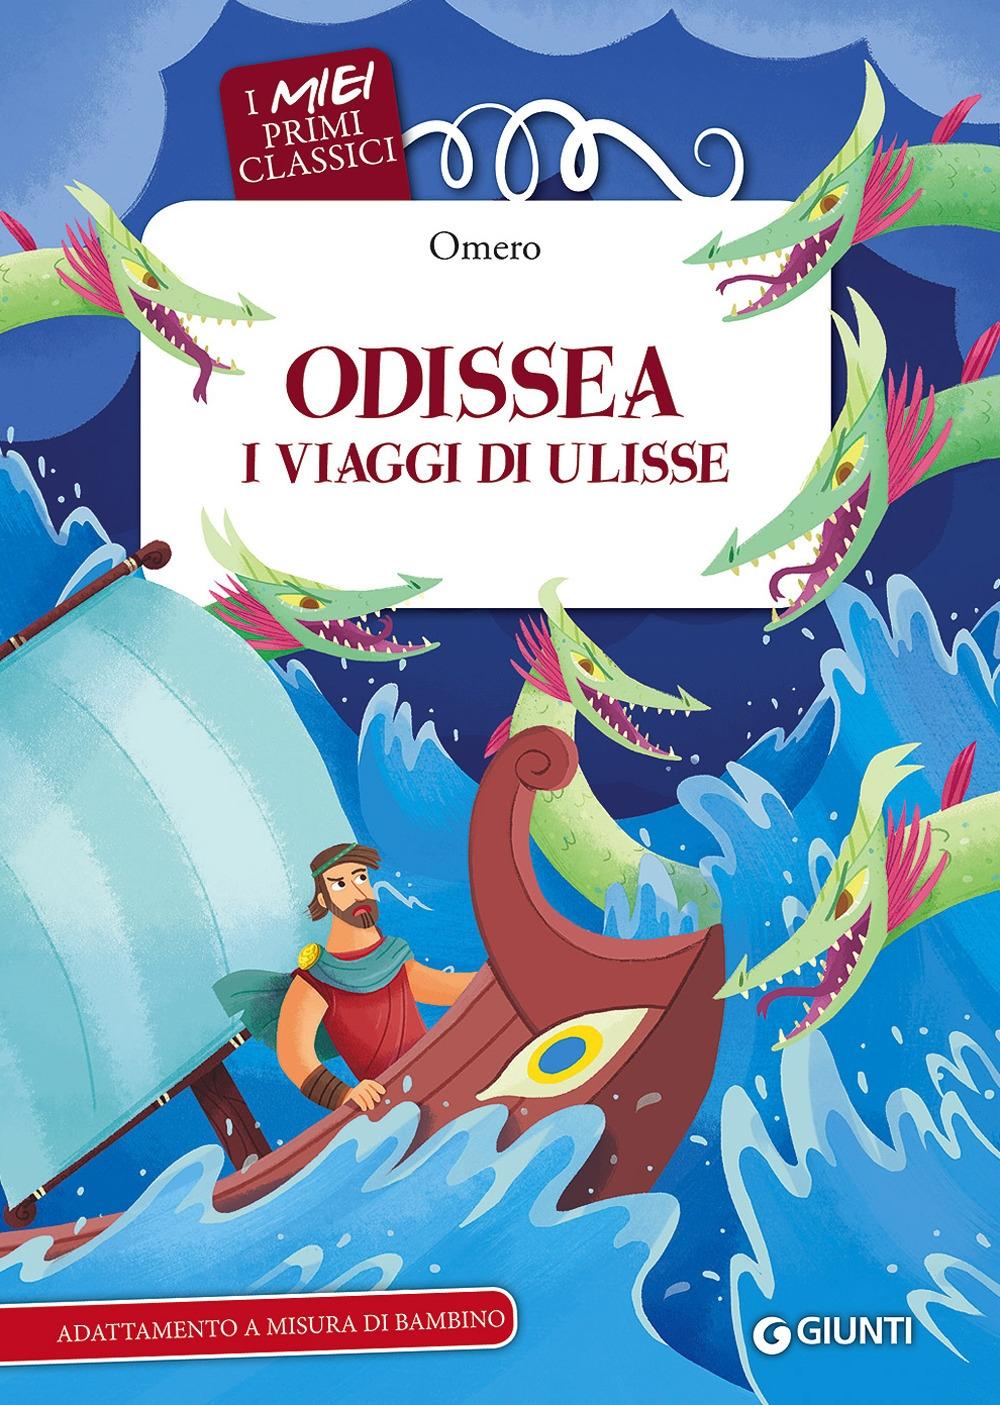 Odissea. I viaggi di Ulisse